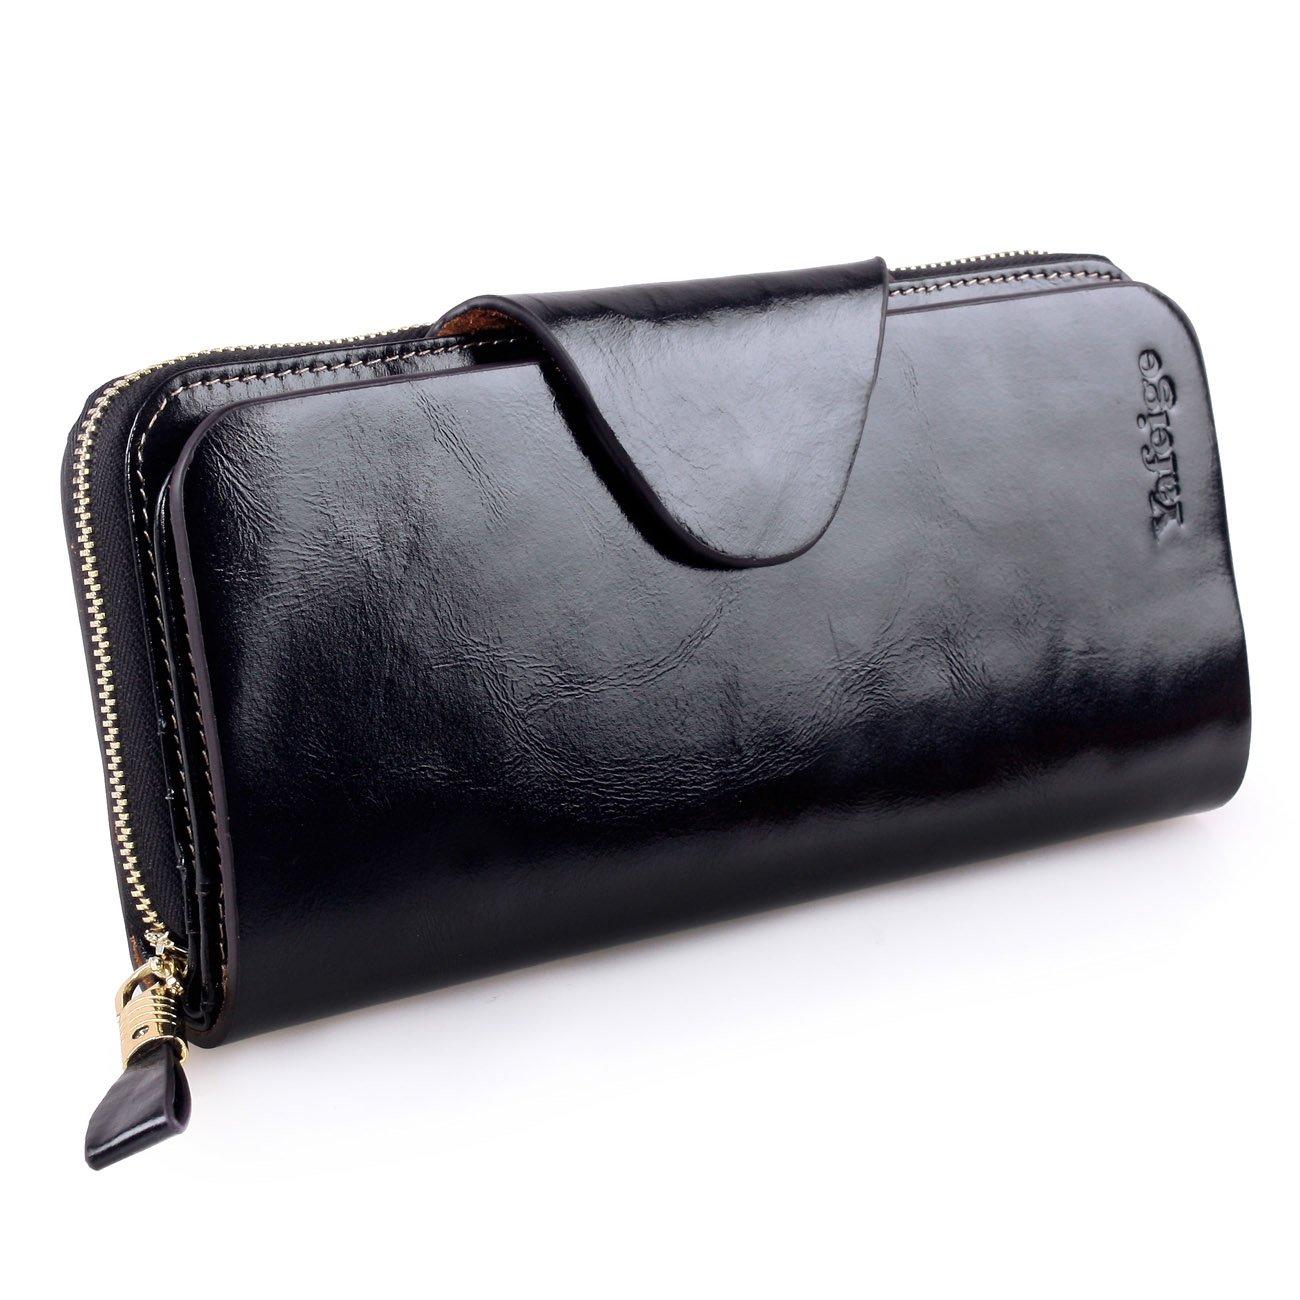 Yafeige Large Luxury Women's RFID Blocking Tri-fold Leather Wallet Zipper Ladies Clutch Purse(Black) by Yafeige